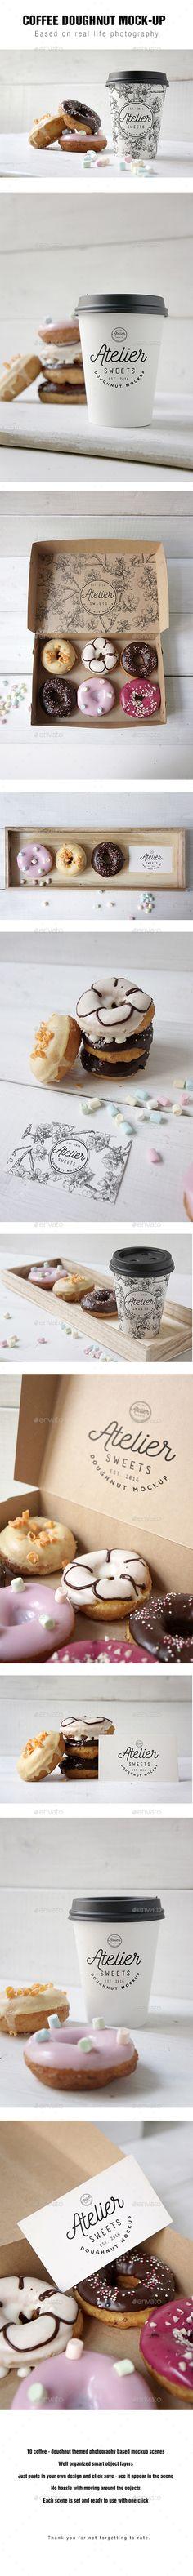 Coffee Doughnut Mockup. Download here: https://graphicriver.net/item/coffee-doughnut-mockup/17144327?ref=ksioks